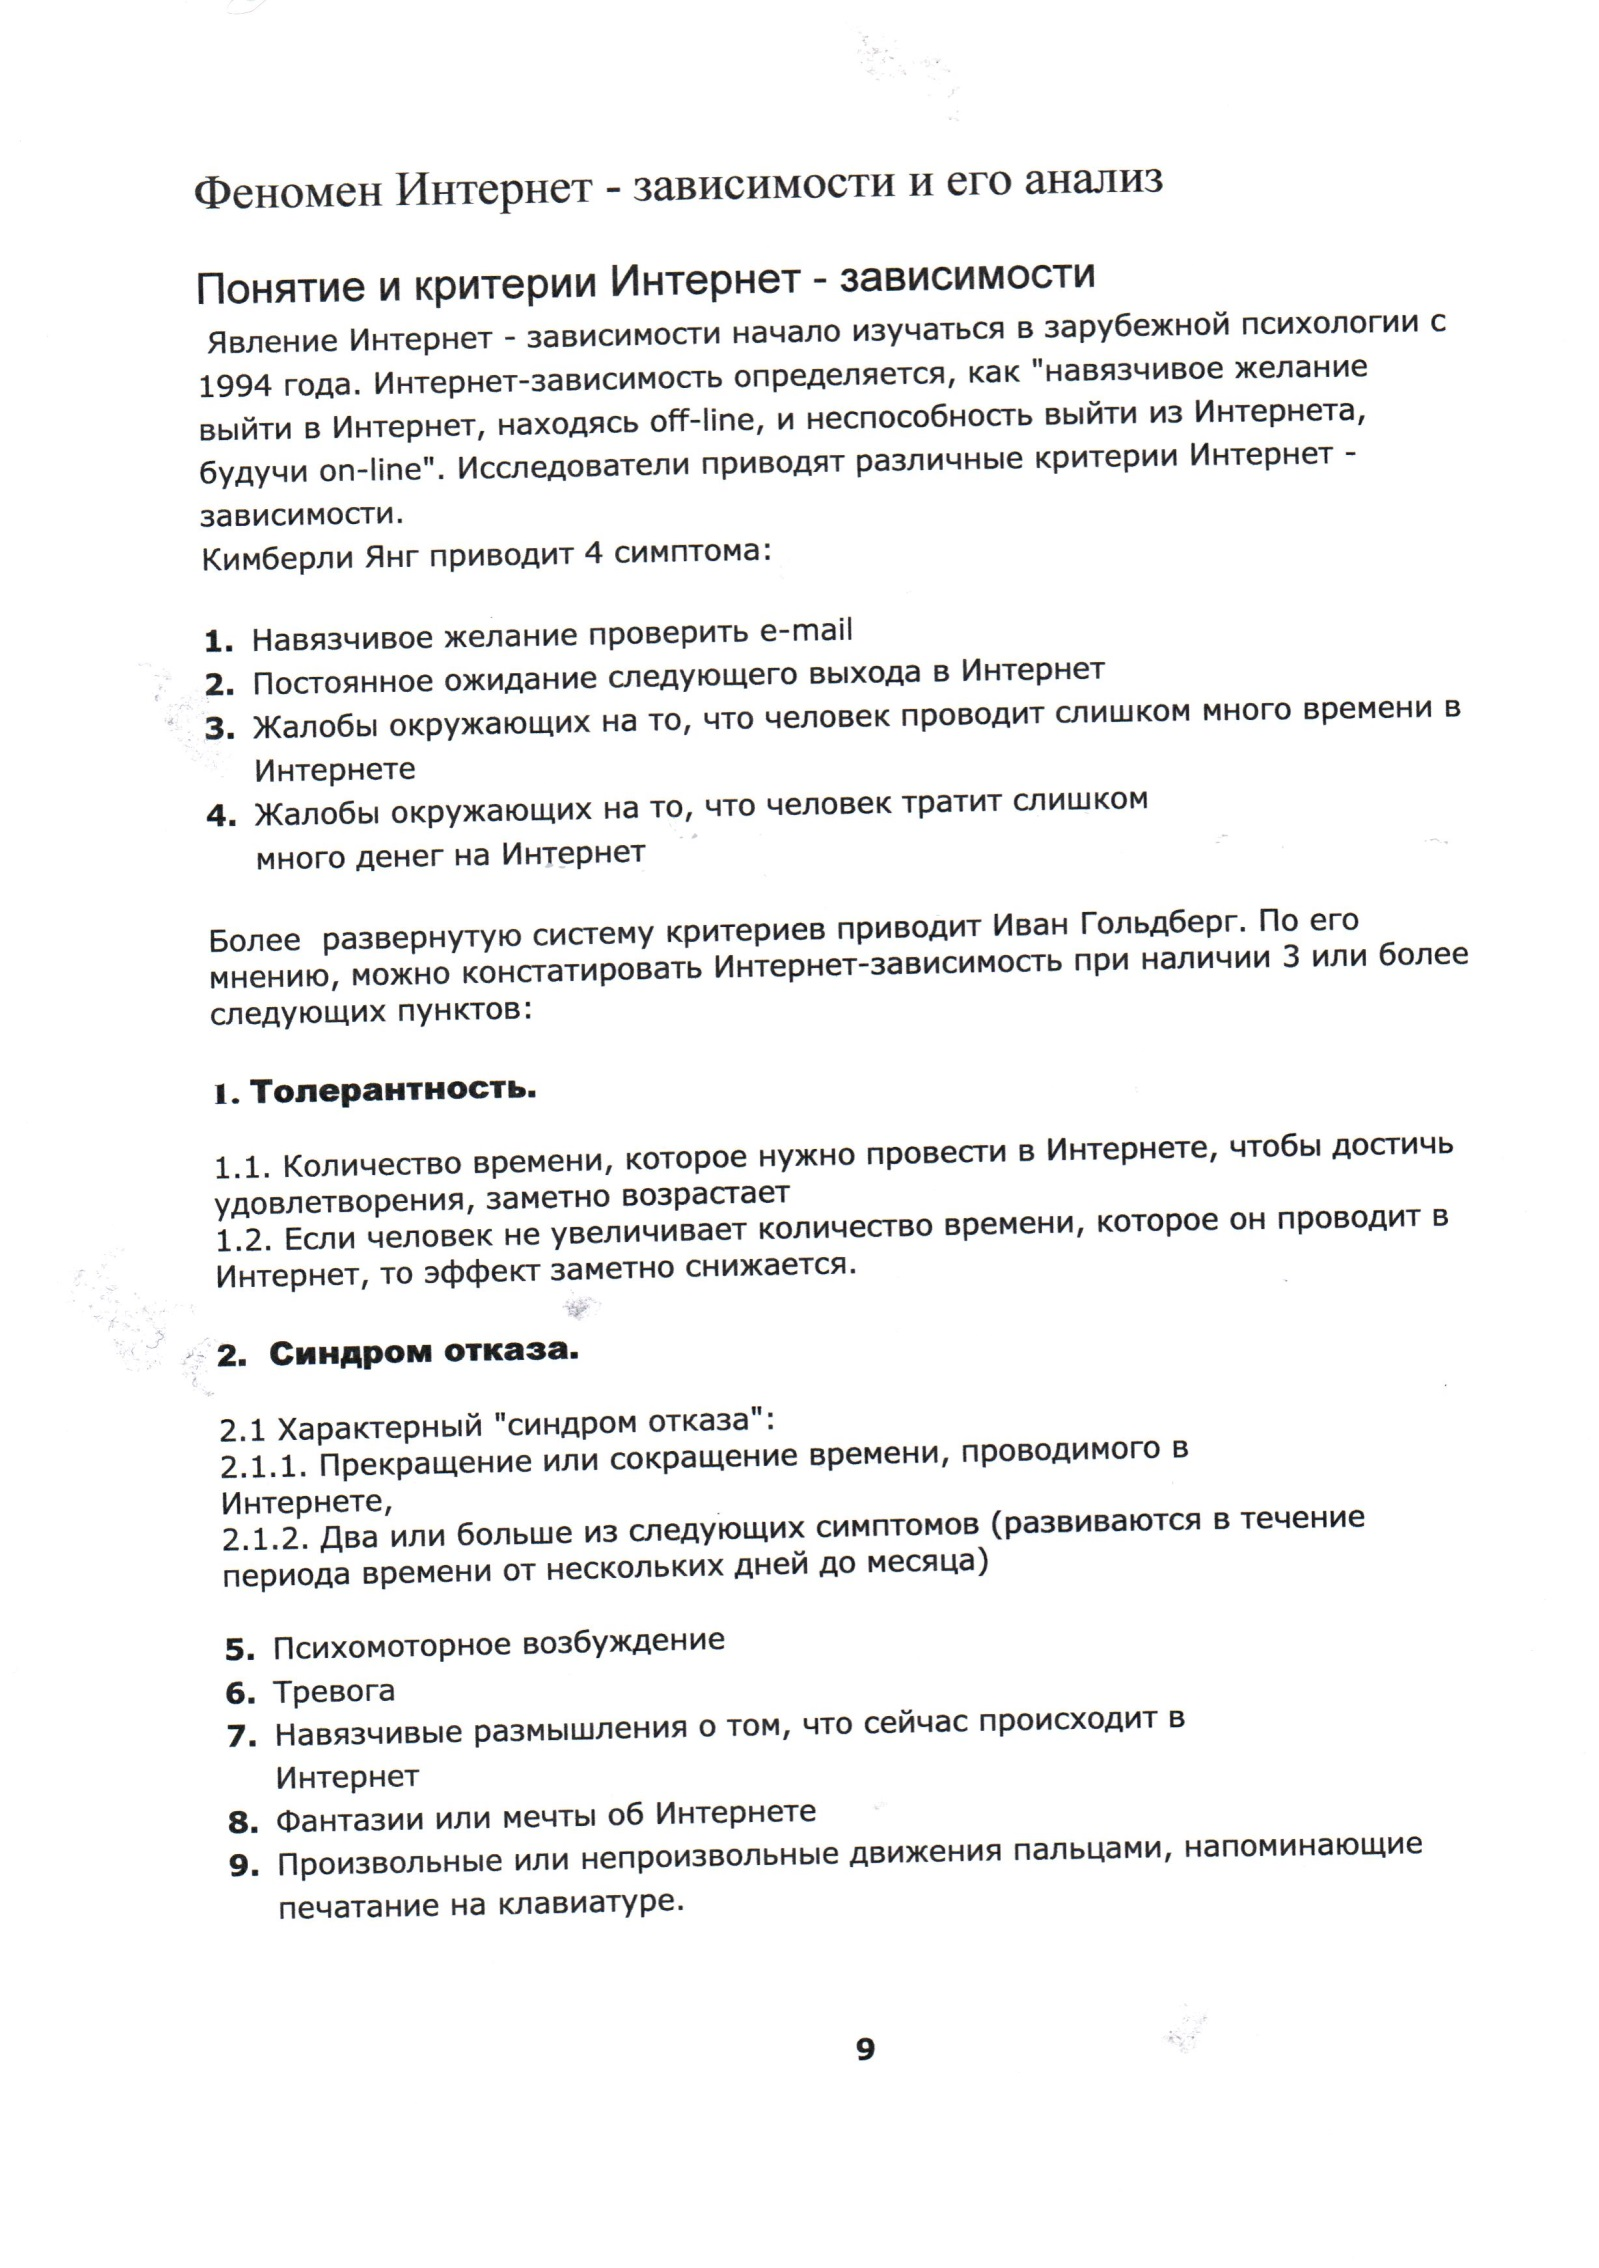 C:\Users\Ирина\Documents\Panasonic\MFS\Scan\20160225_104703.jpg